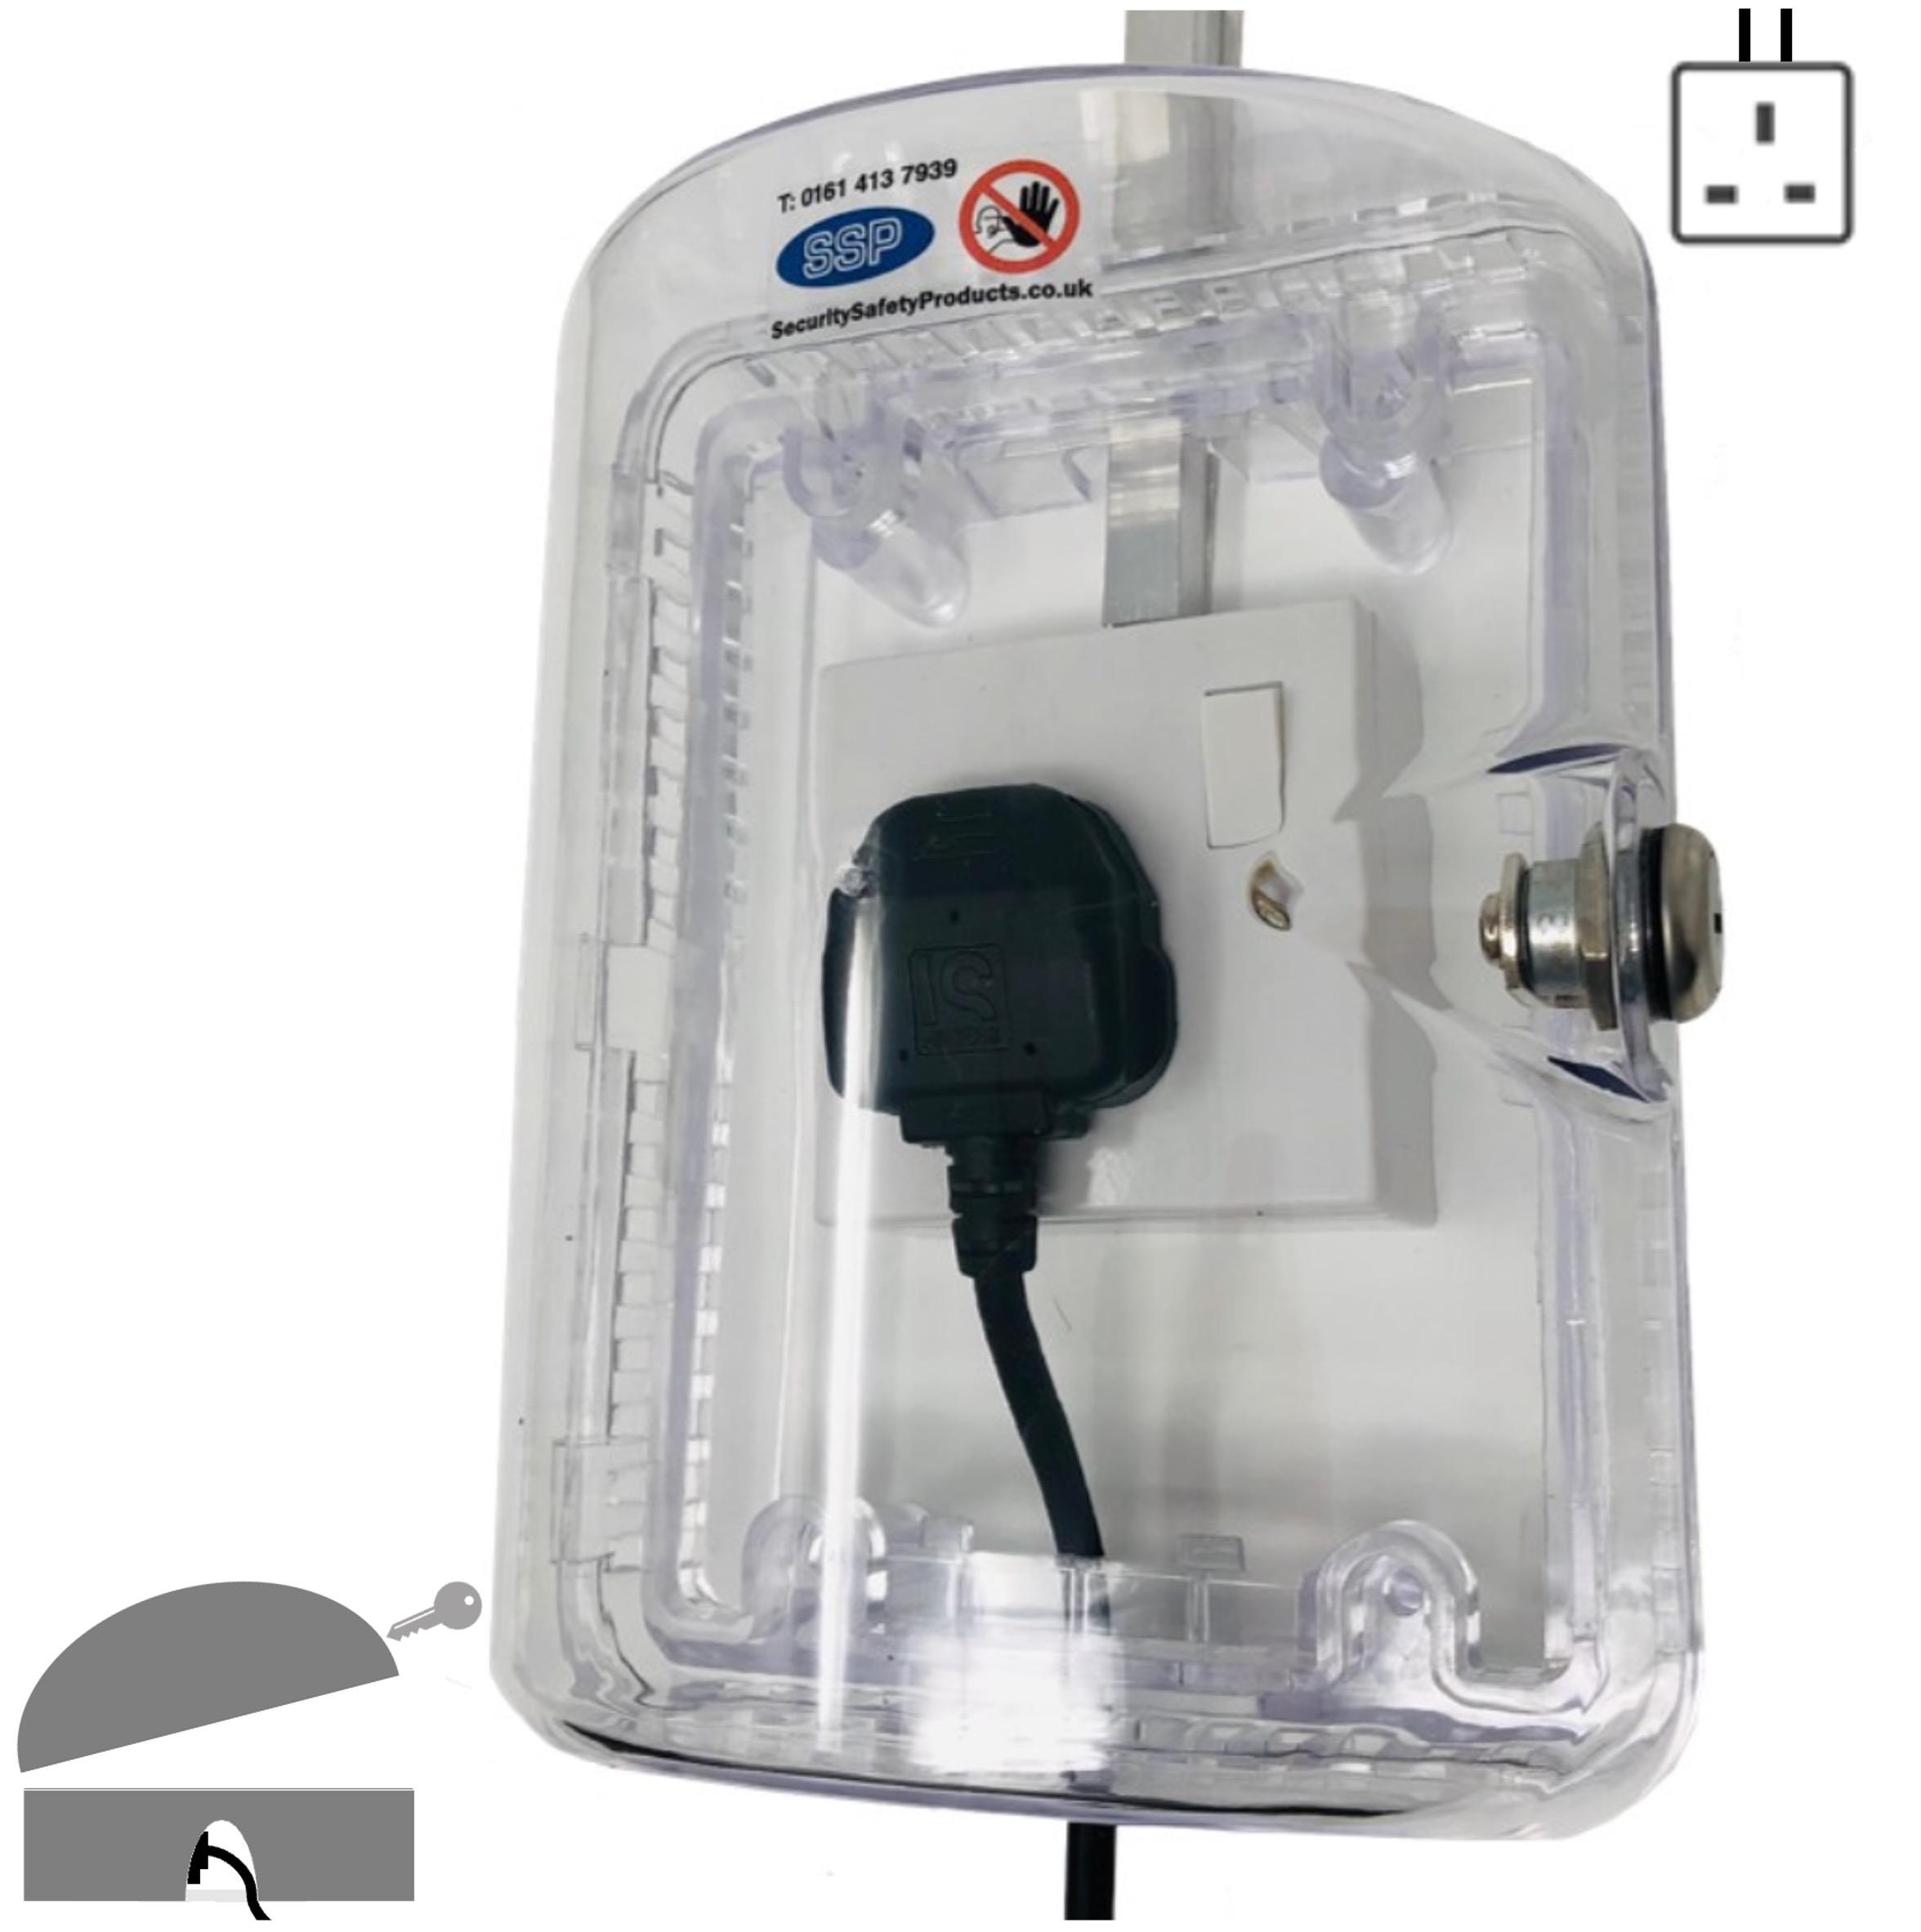 Clearstop Anti Tamper Locking Electrical Single Plug